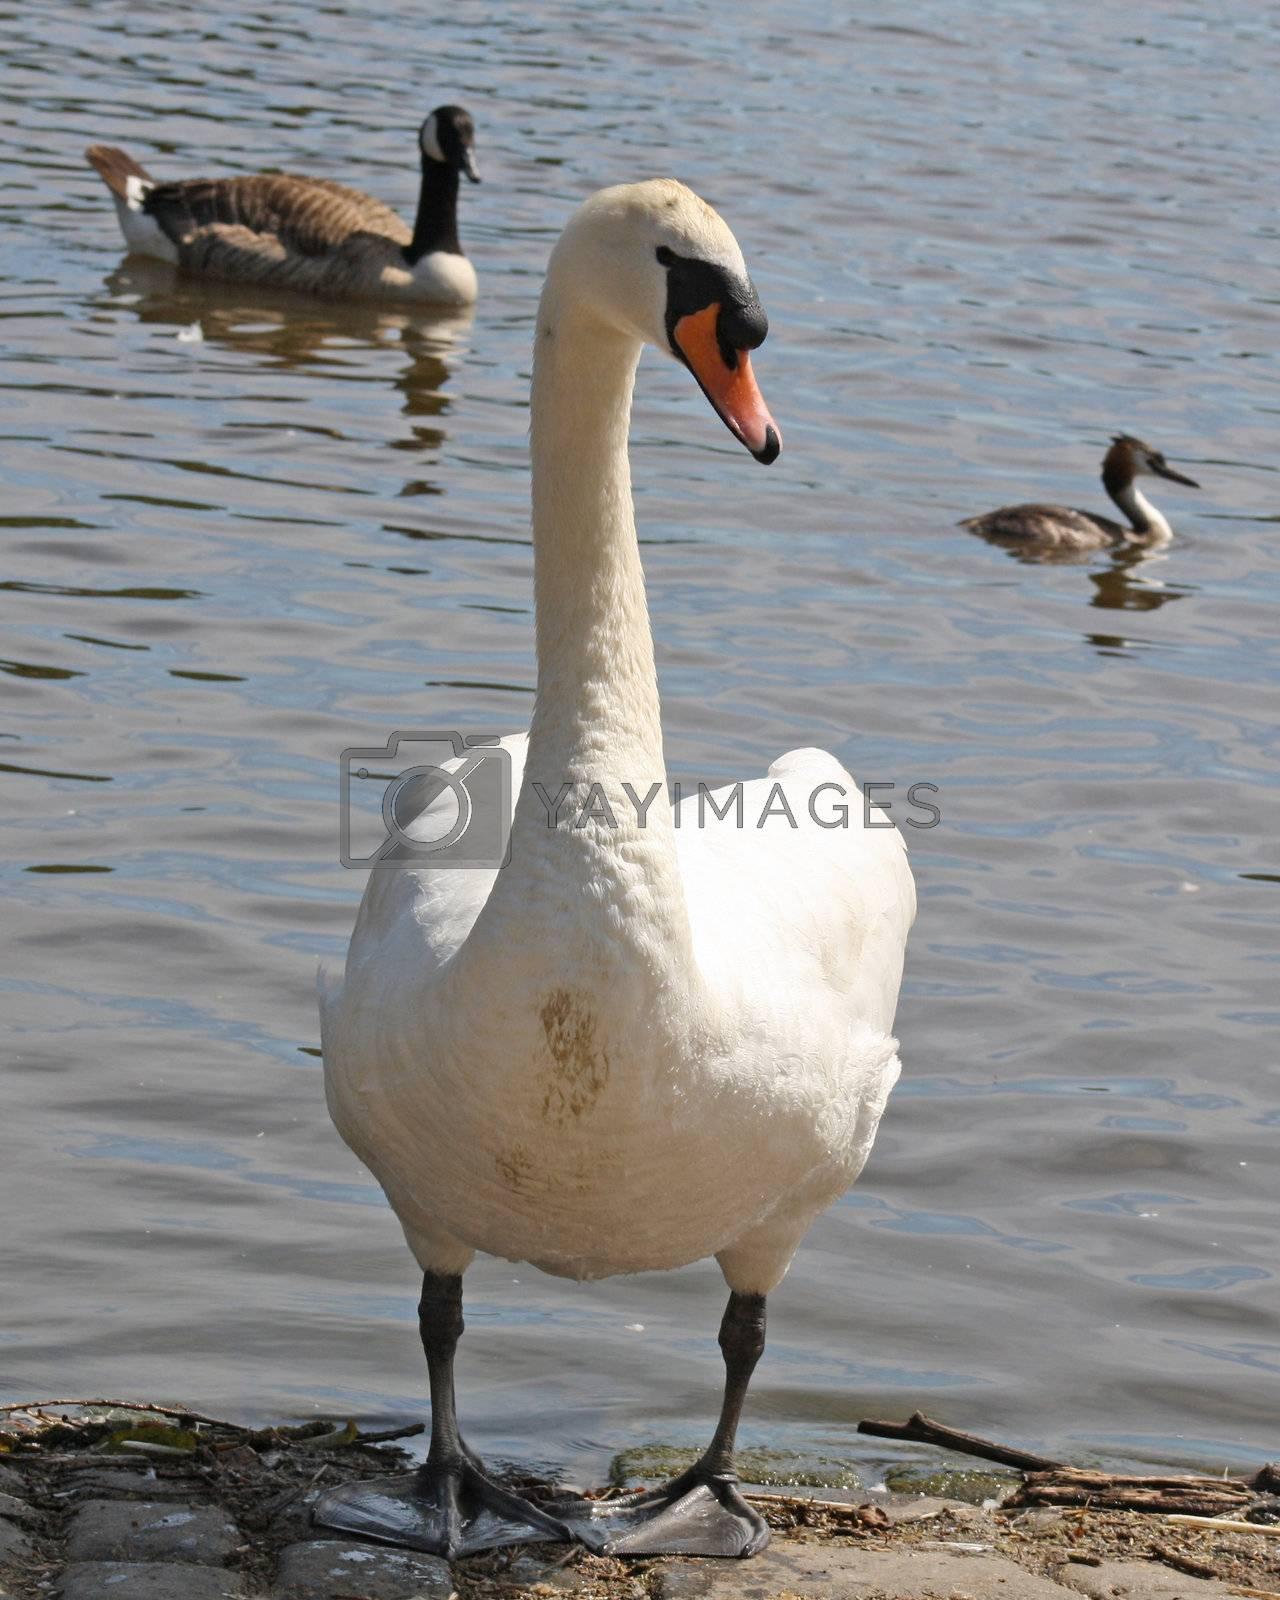 Royalty free image of swan by lizapixels